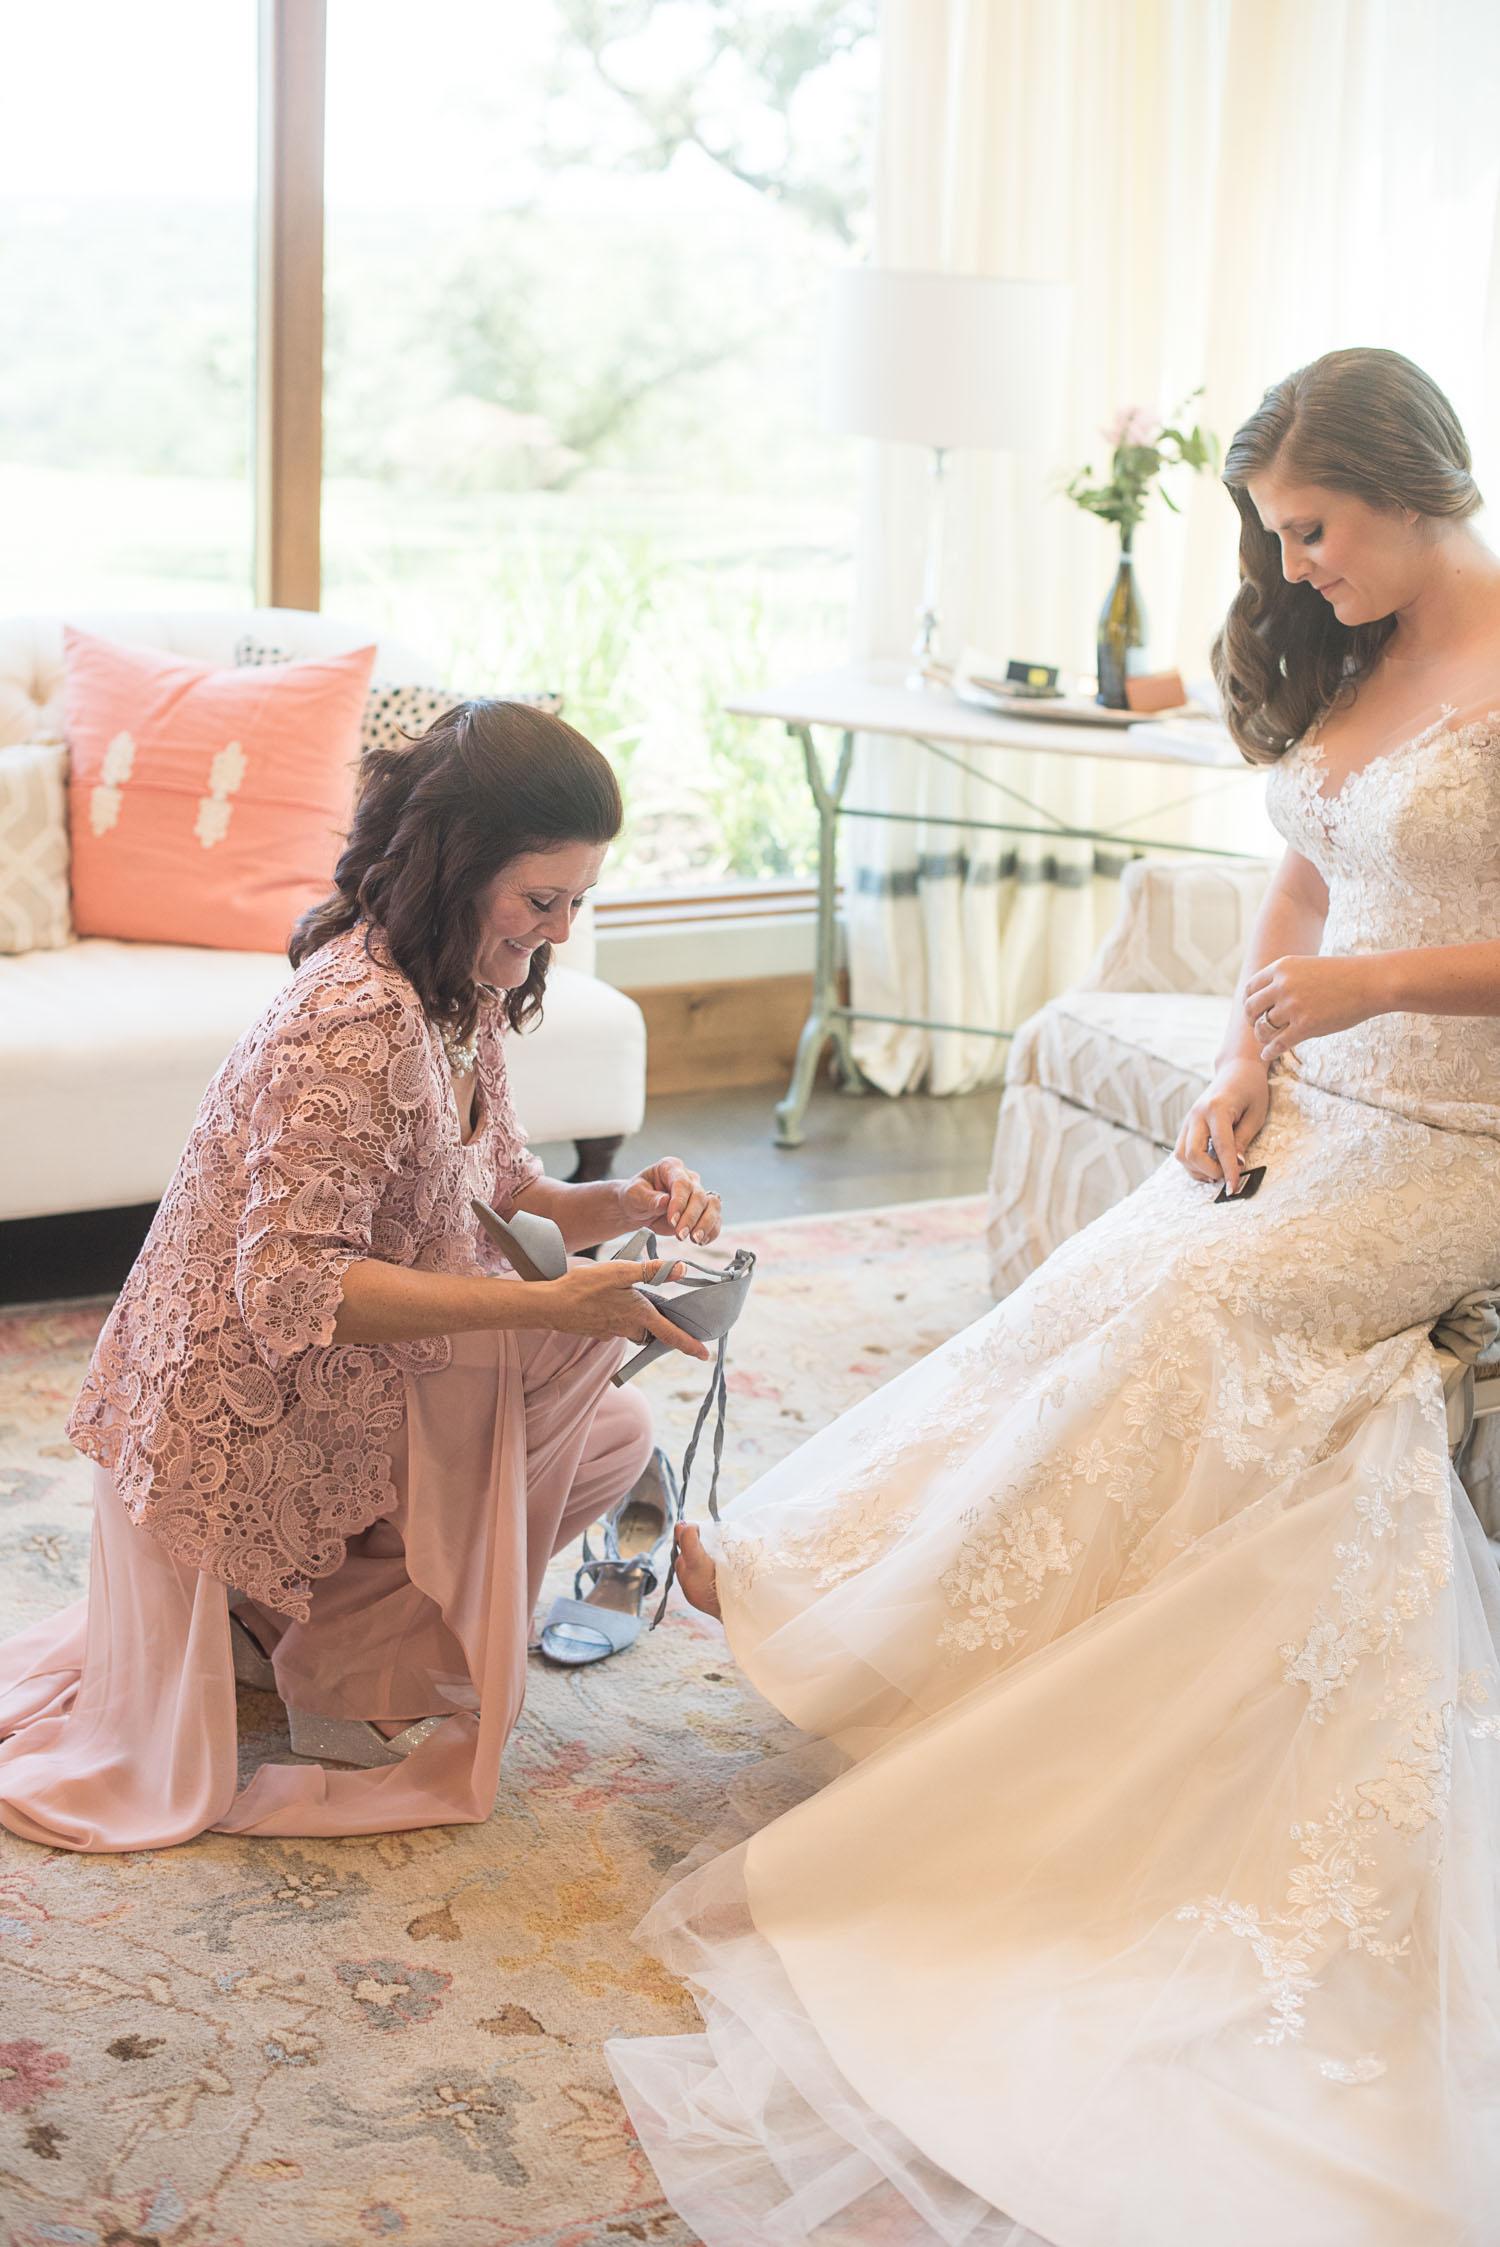 Hinton Wedding at Canyonwood Ridge Dripping Springs Texas Wedding Photography-59.jpg